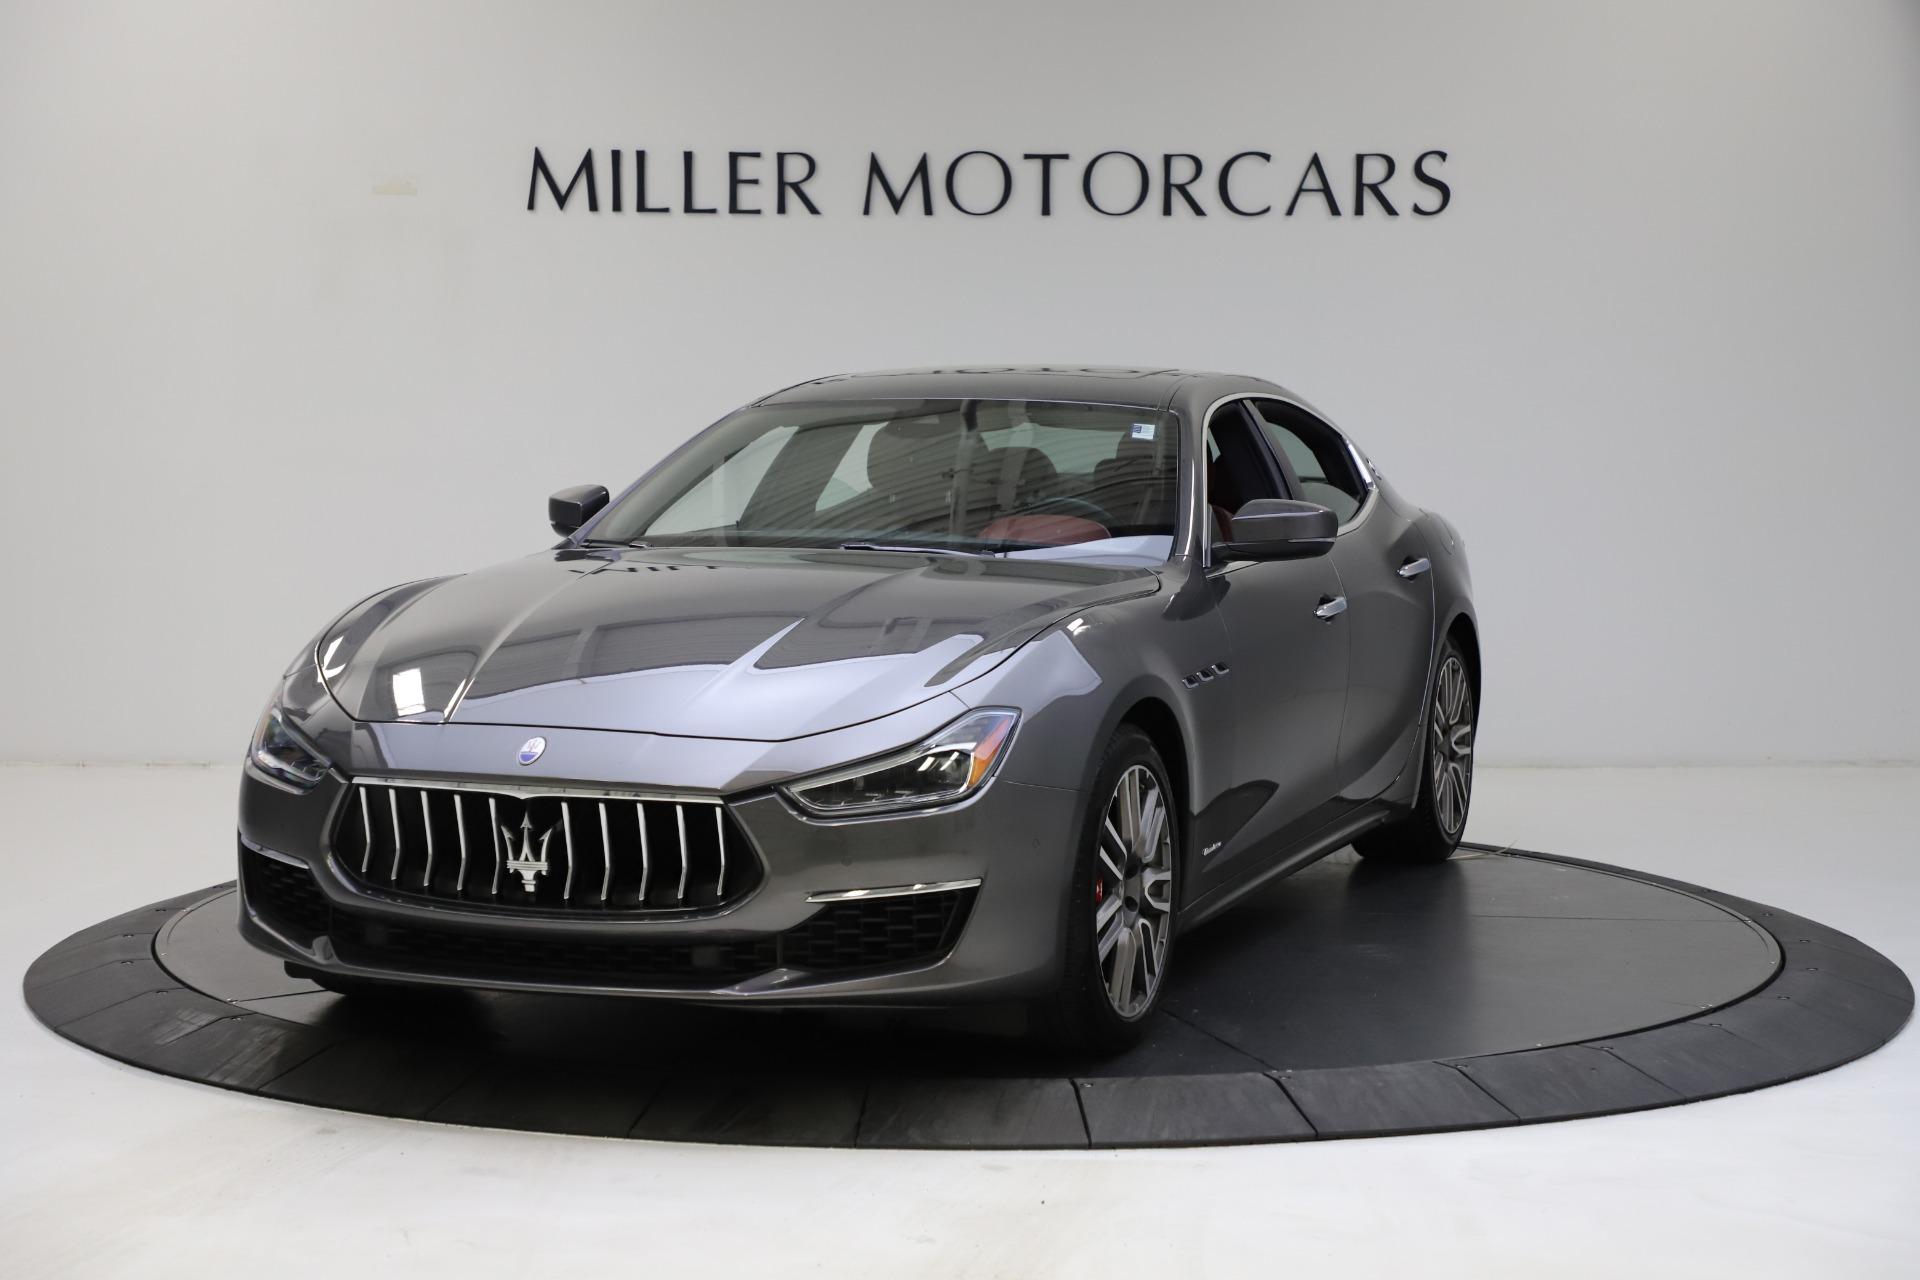 Used 2018 Maserati Ghibli SQ4 GranLusso for sale $55,900 at McLaren Greenwich in Greenwich CT 06830 1